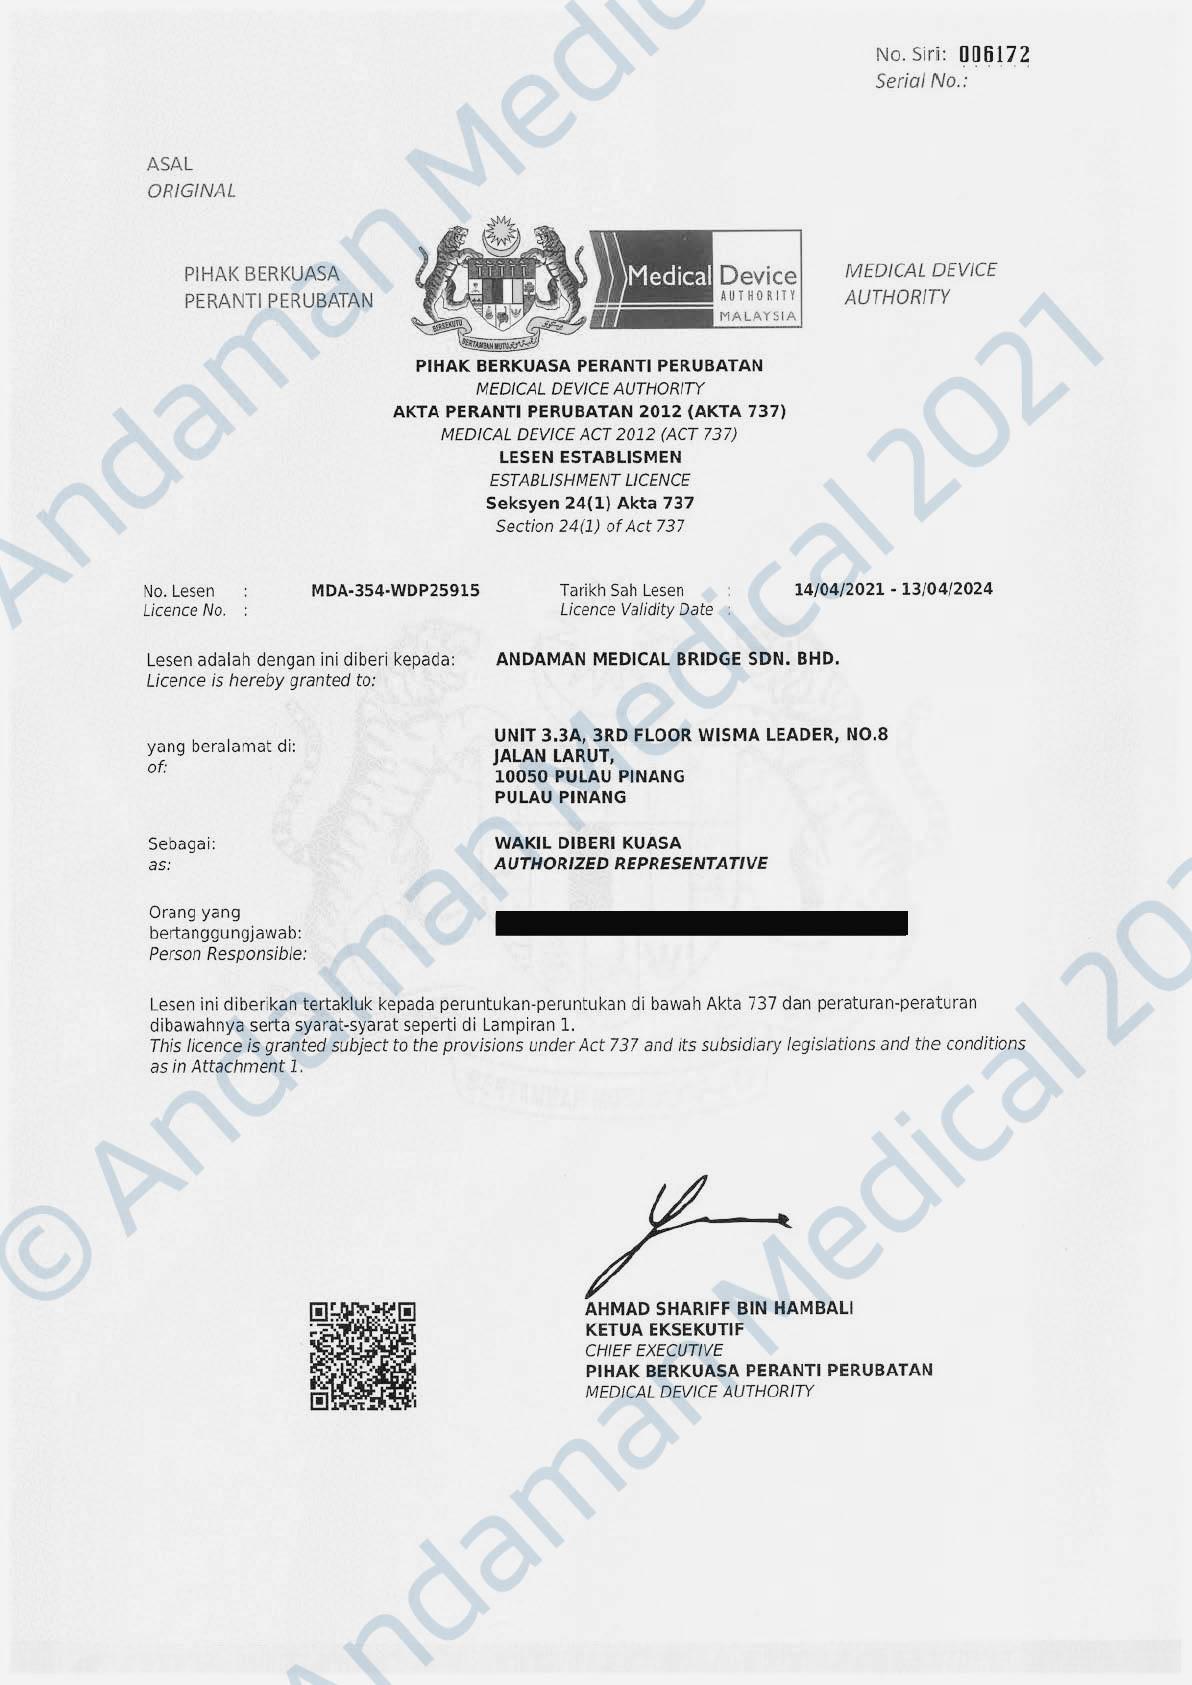 Andaman Medical Malaysia MDA Establishment License 13042024